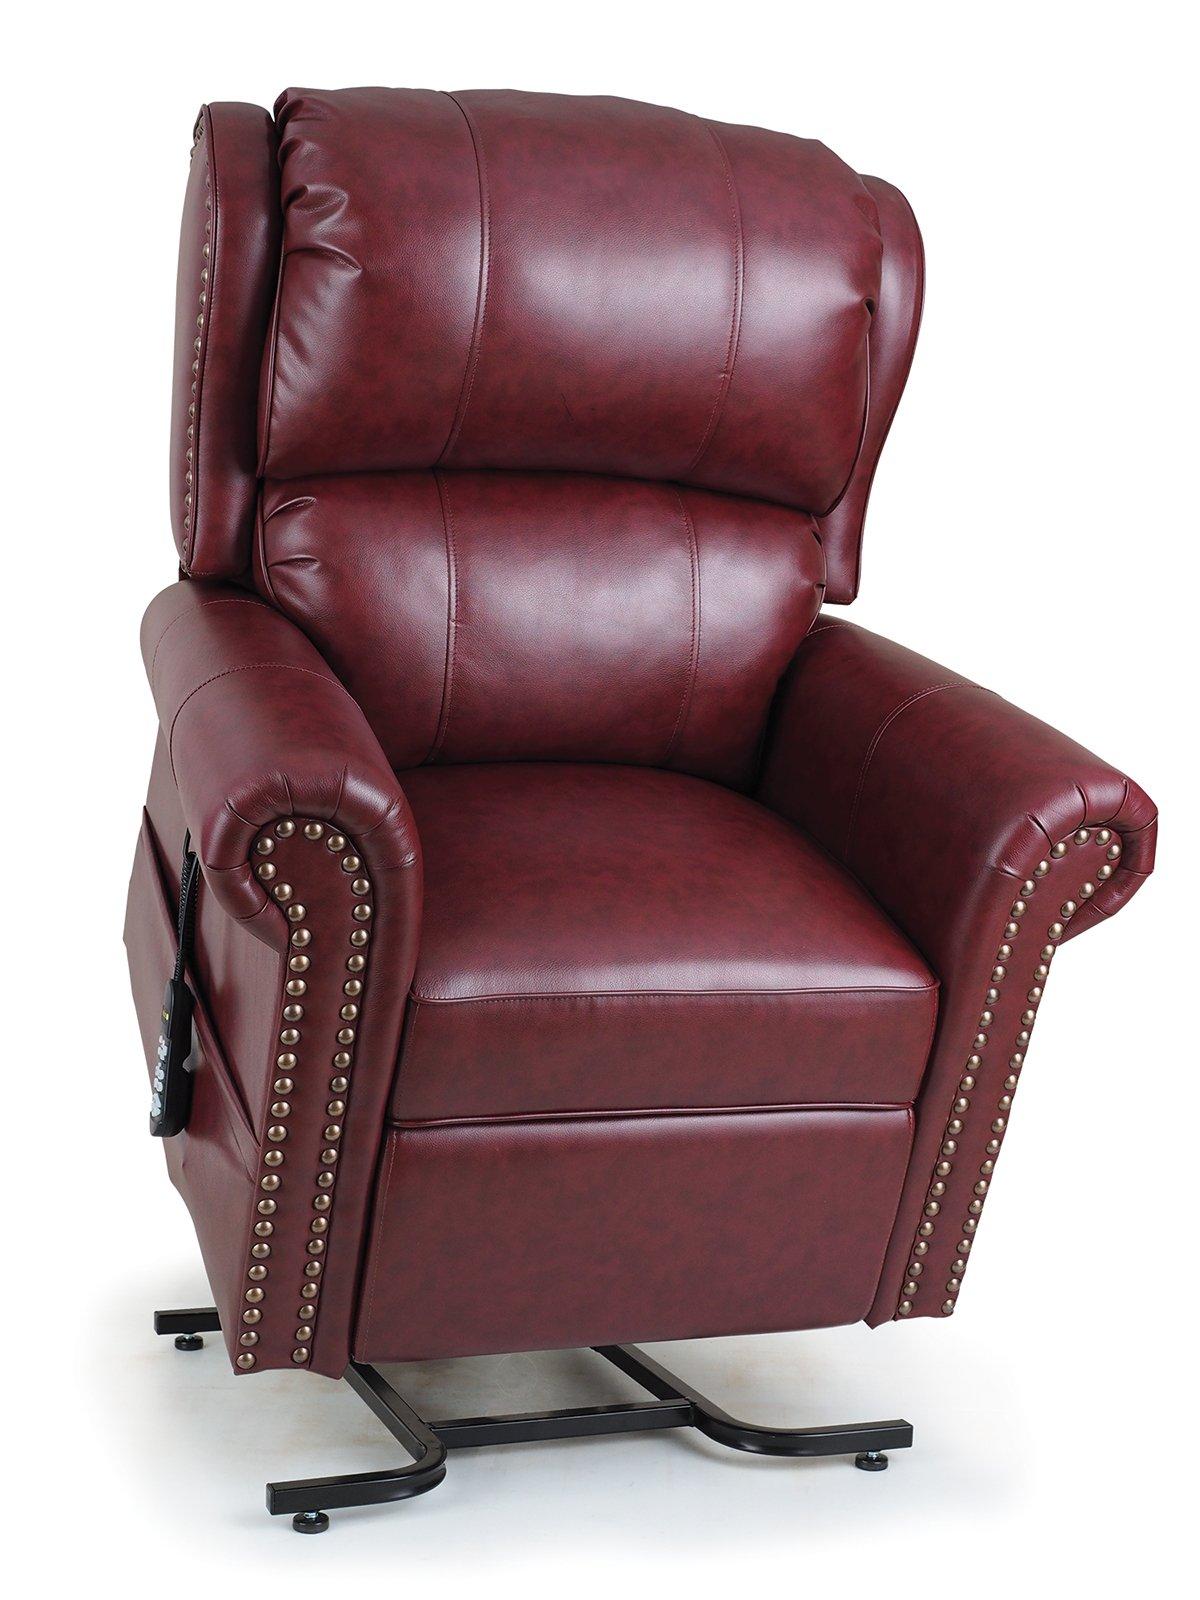 Golden Technologies Maxicomfort Pub Lift Chair PR-712 - Geranium (Valor Vinyl)